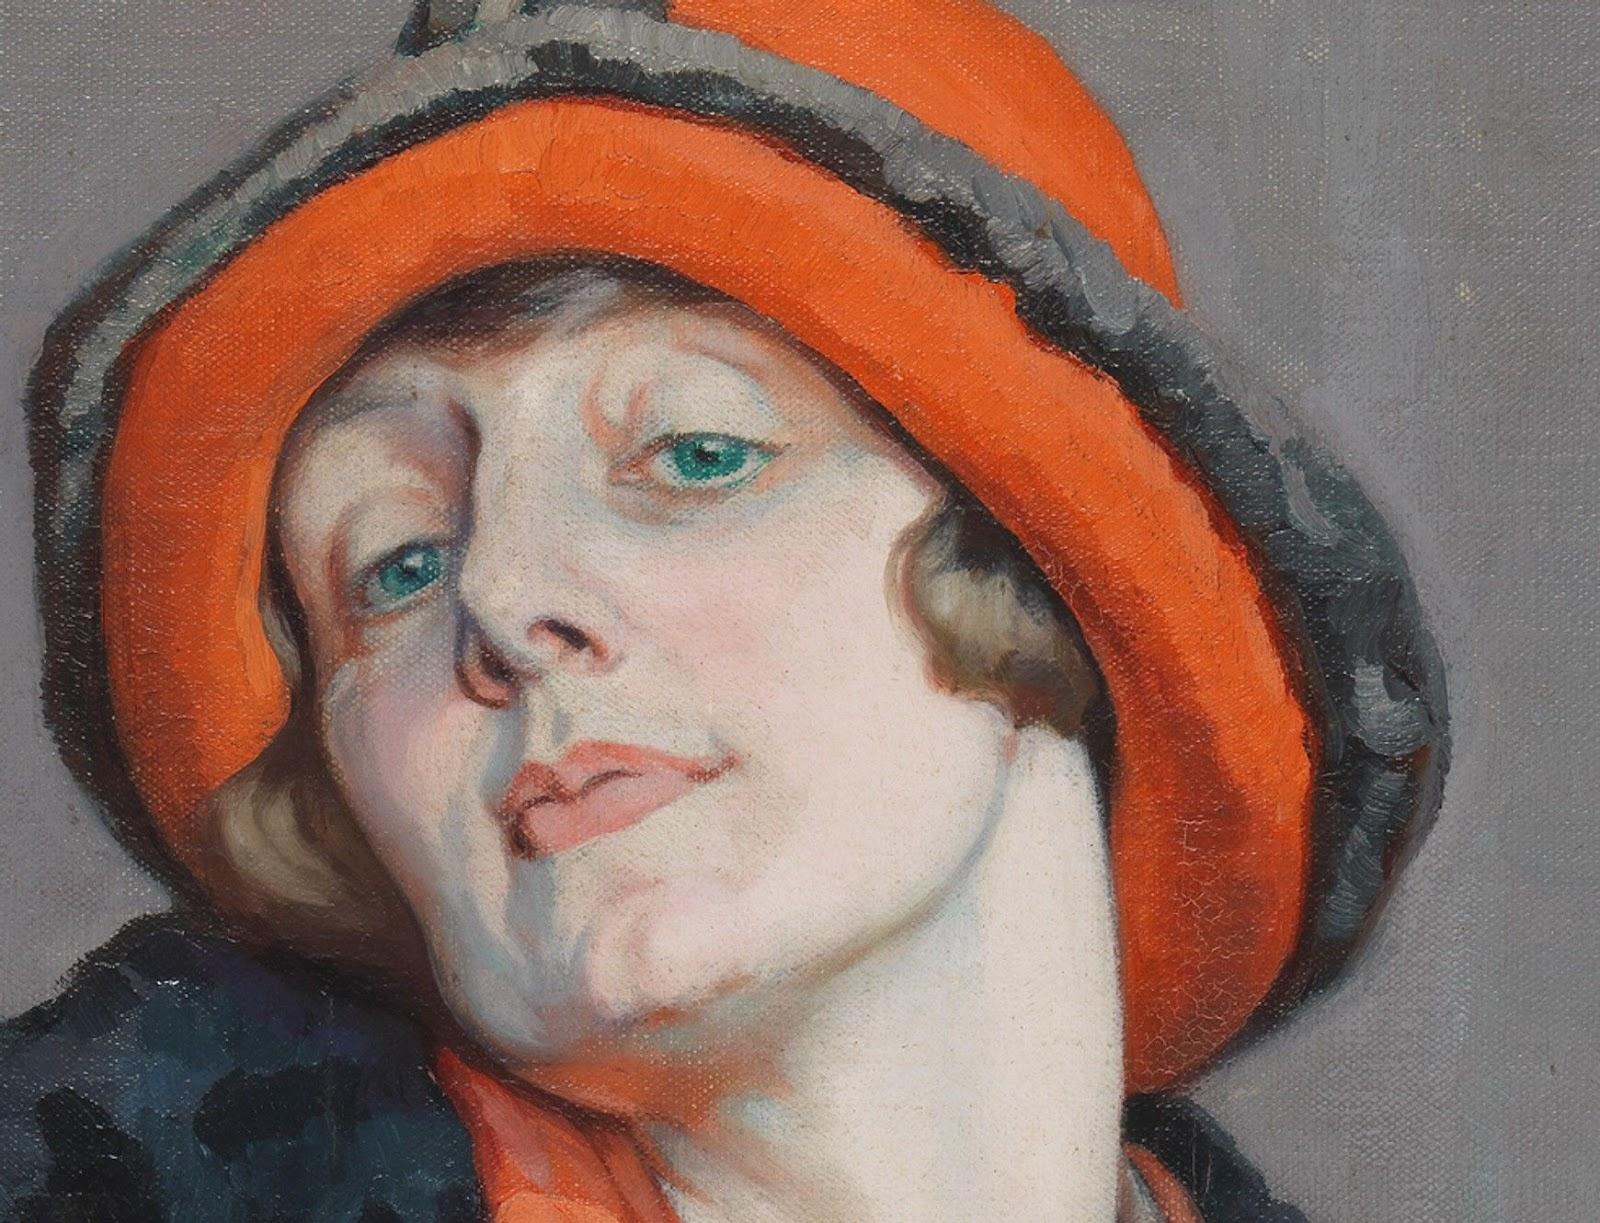 Hilda Rix Nicholas Une Australienne National Gallery of Australia detail